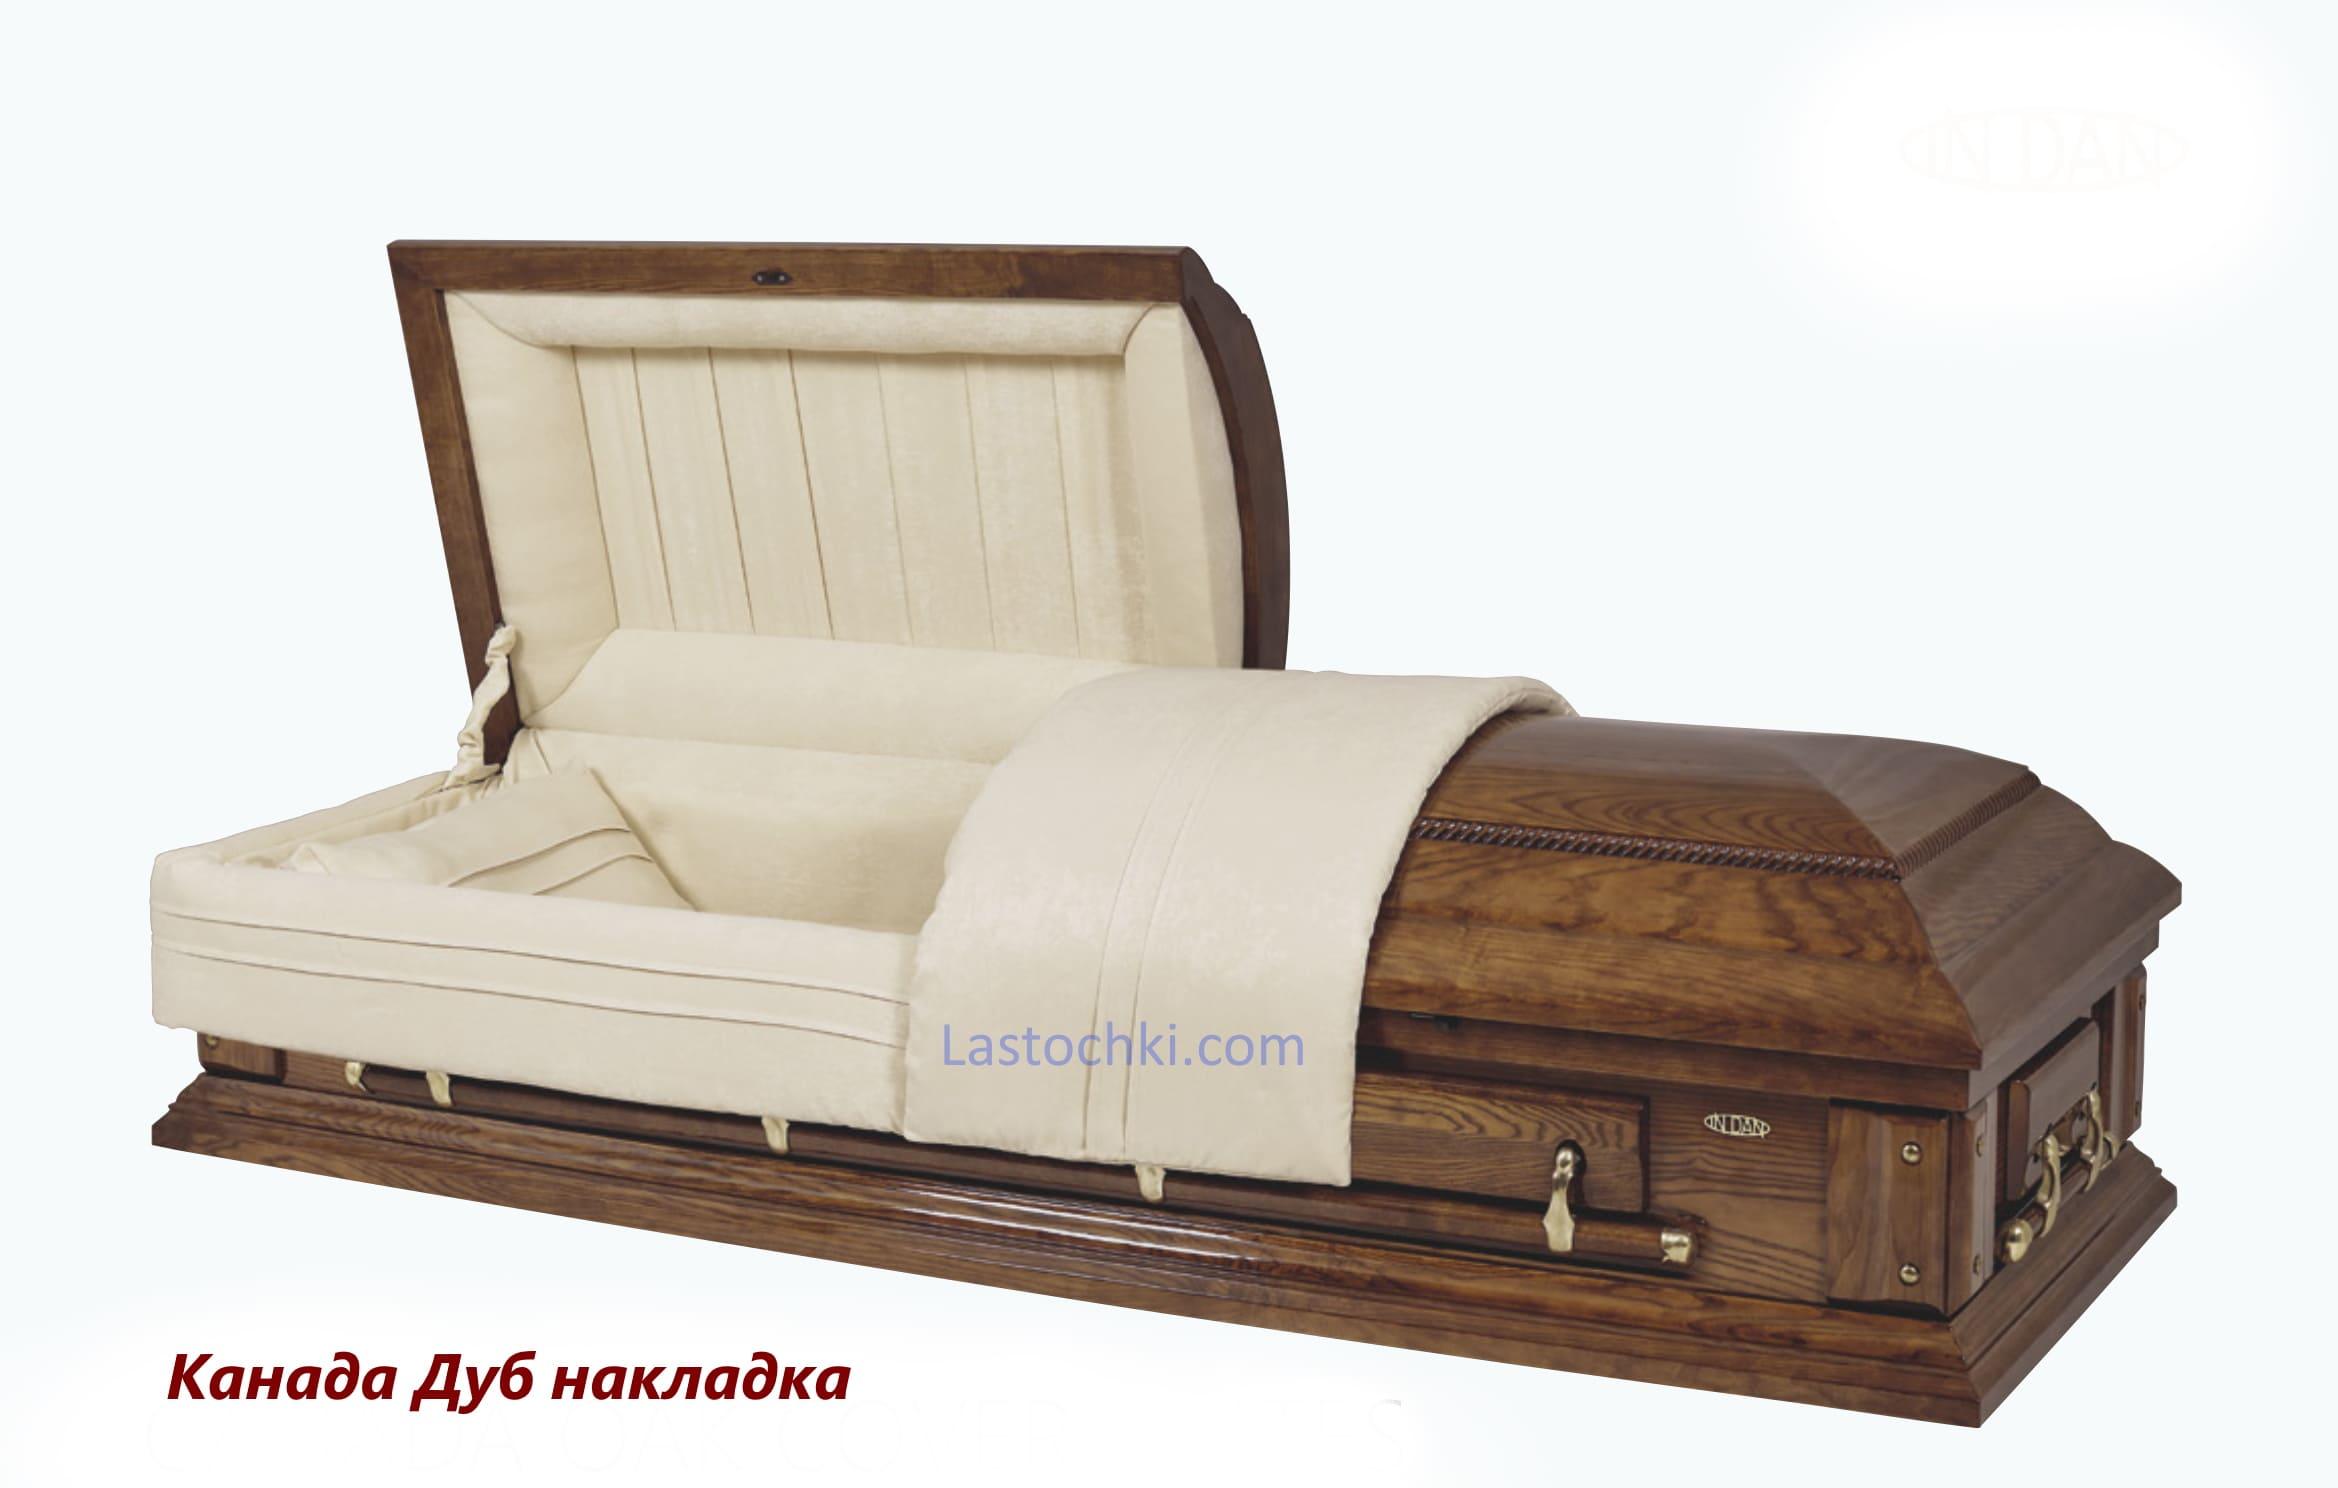 Саркофаг Канада Дуб накладка  -  Цена 84 000 грн.